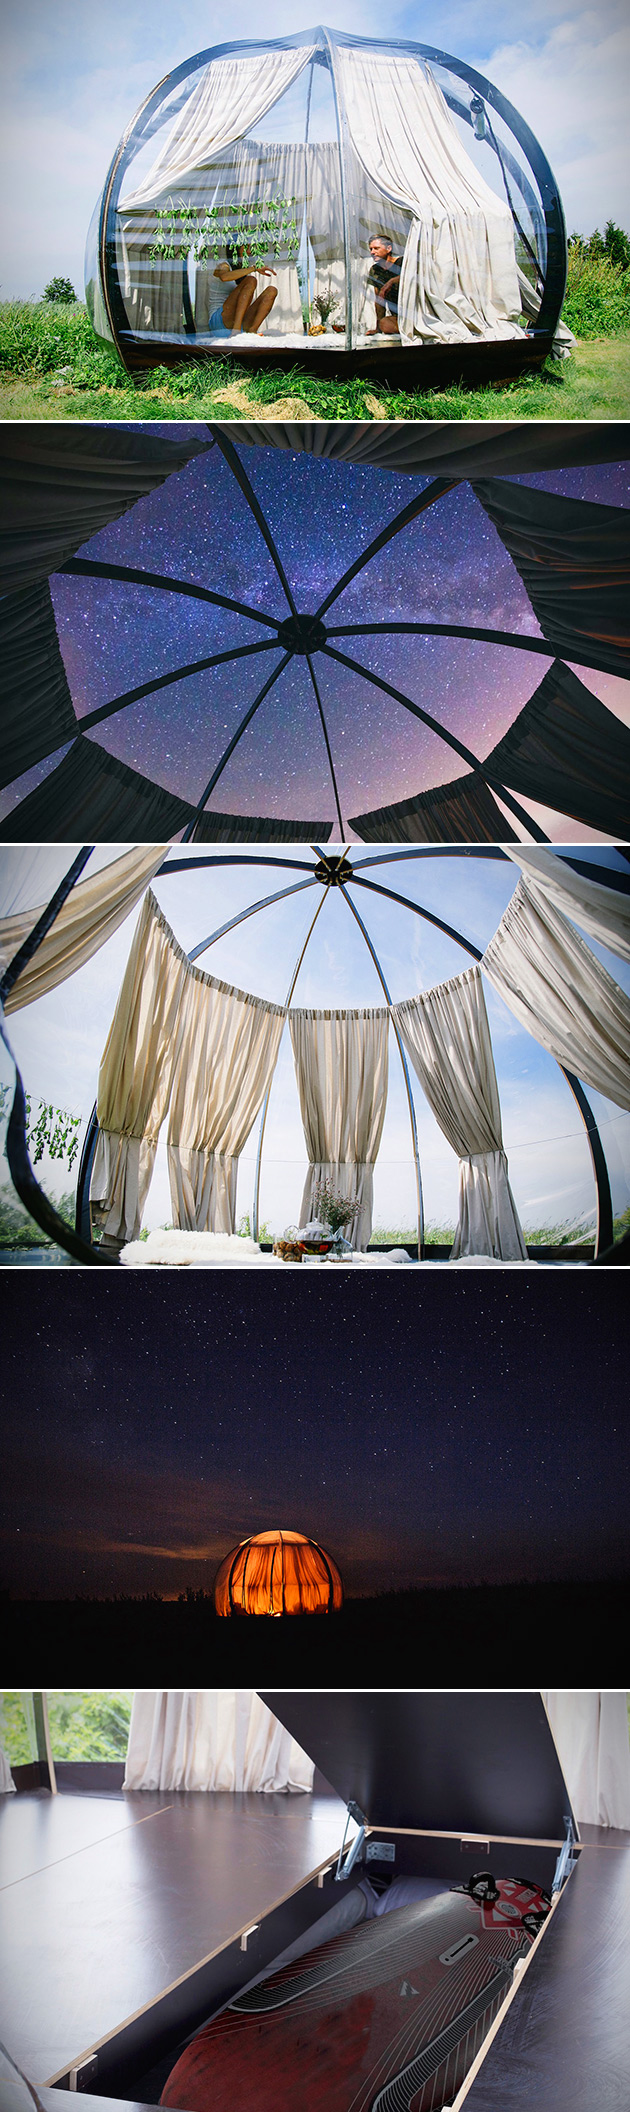 Transparent Dome Oasis